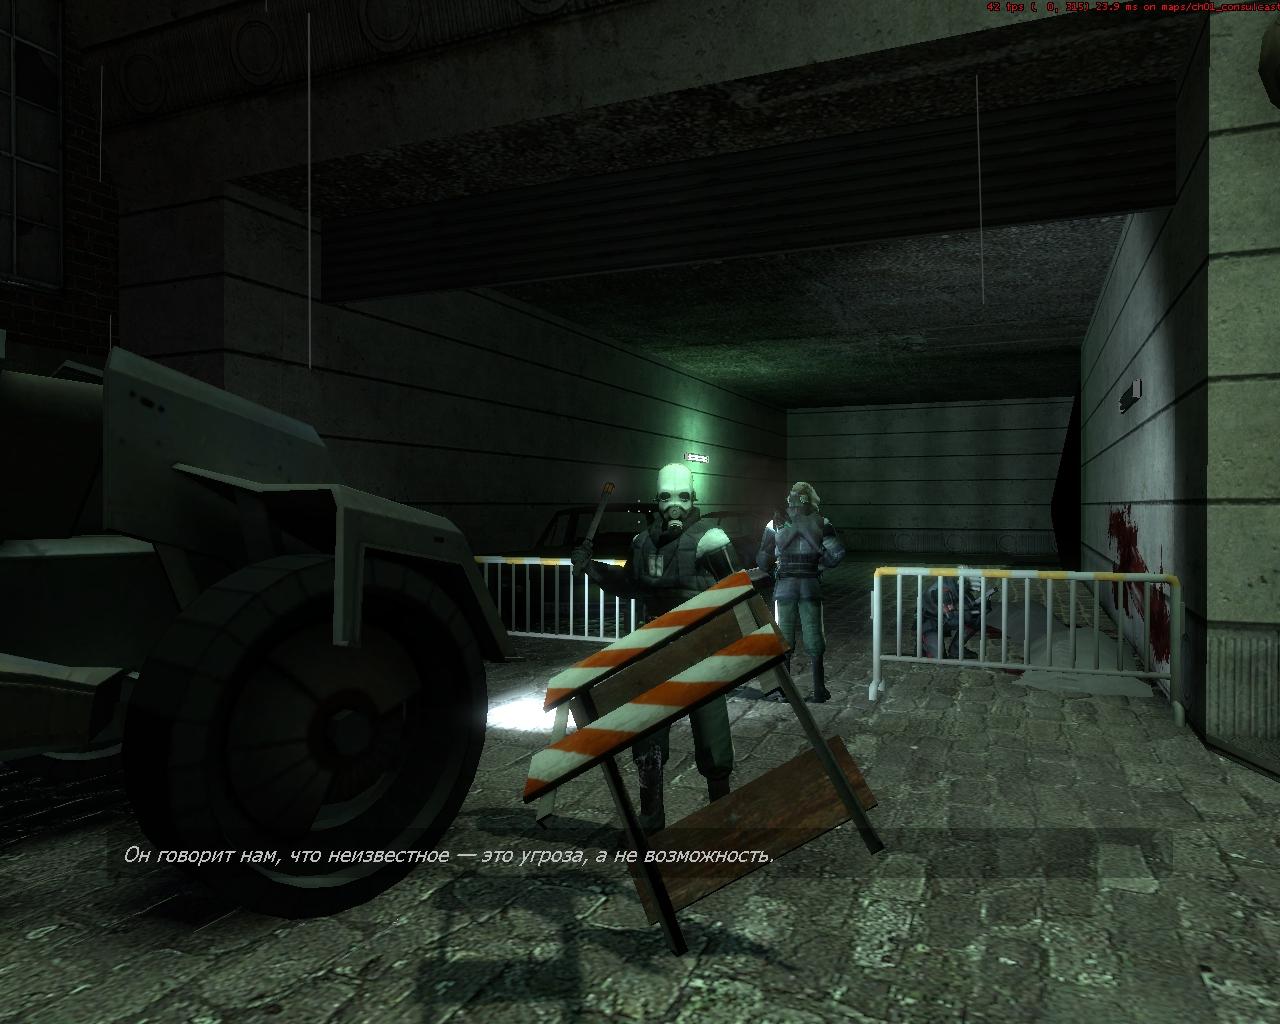 ch01_consulcast0104.jpg - Half-Life 2 ch01_consulcast, Dark Interval, Dark Interval: Part 1